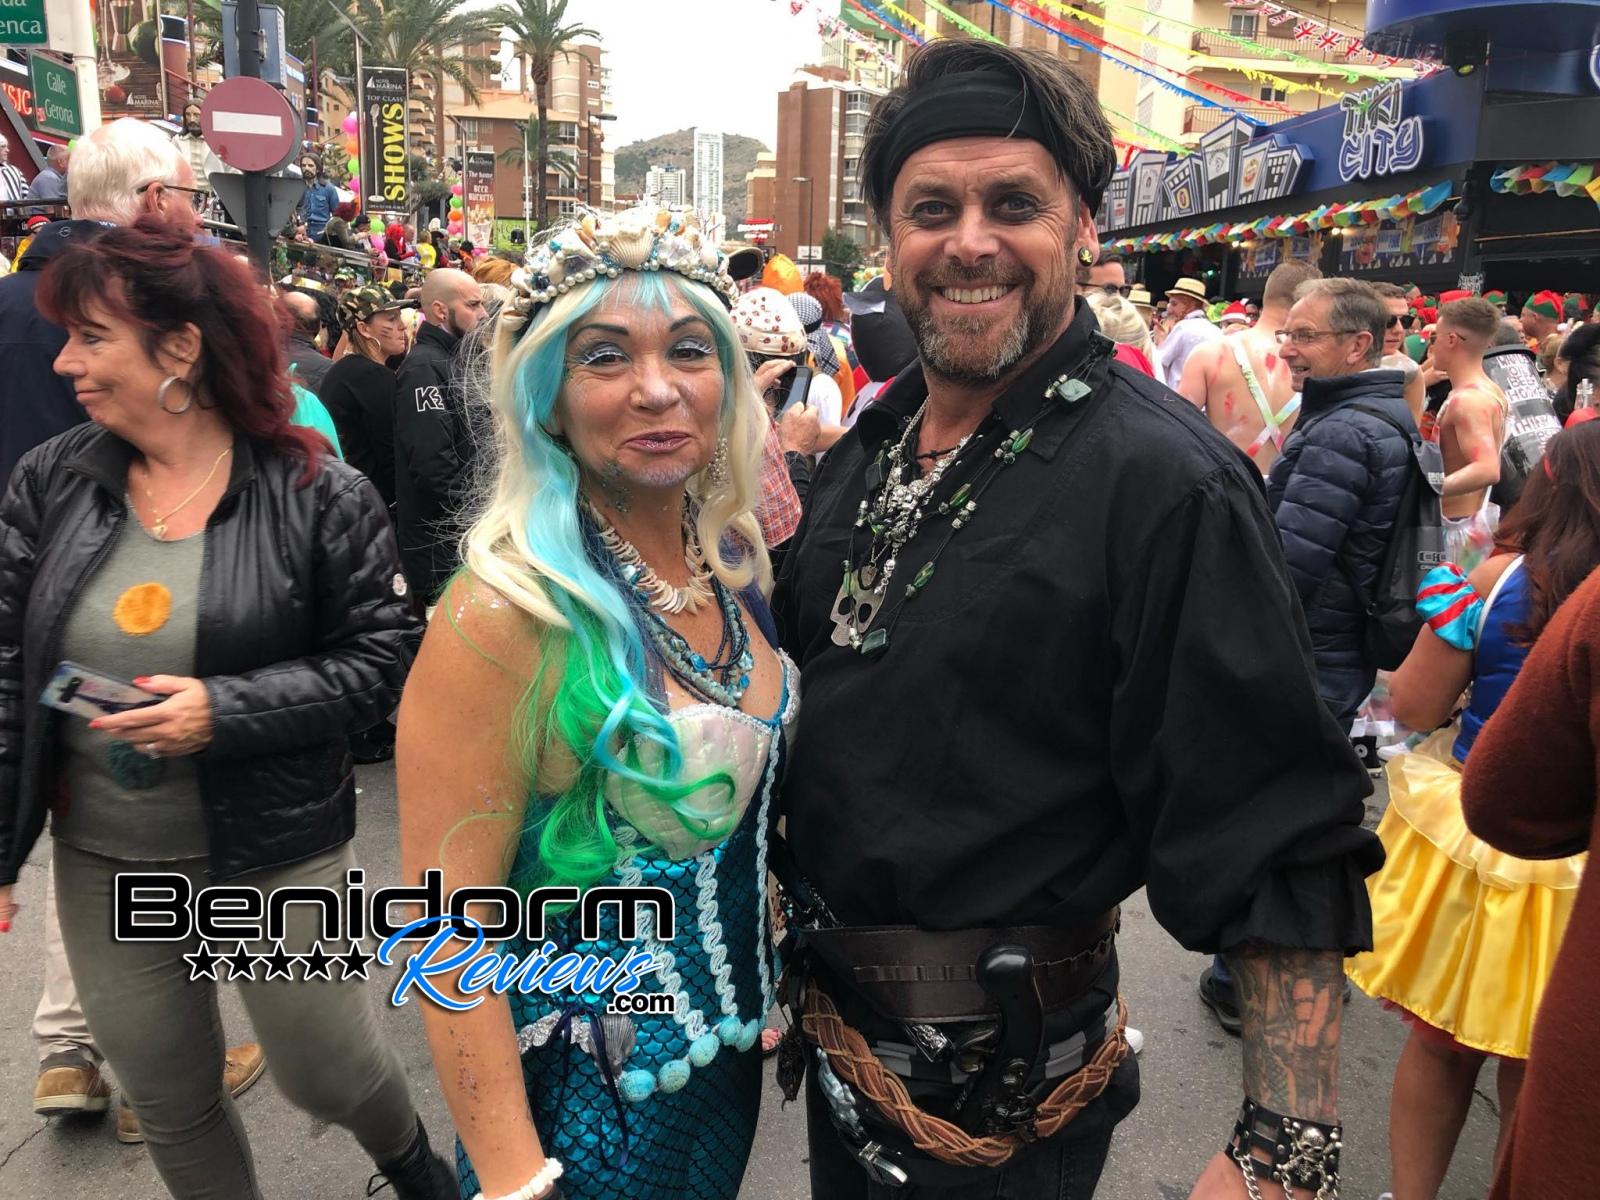 Benidorm-Fiestas-2019-Fancy-Dress-275